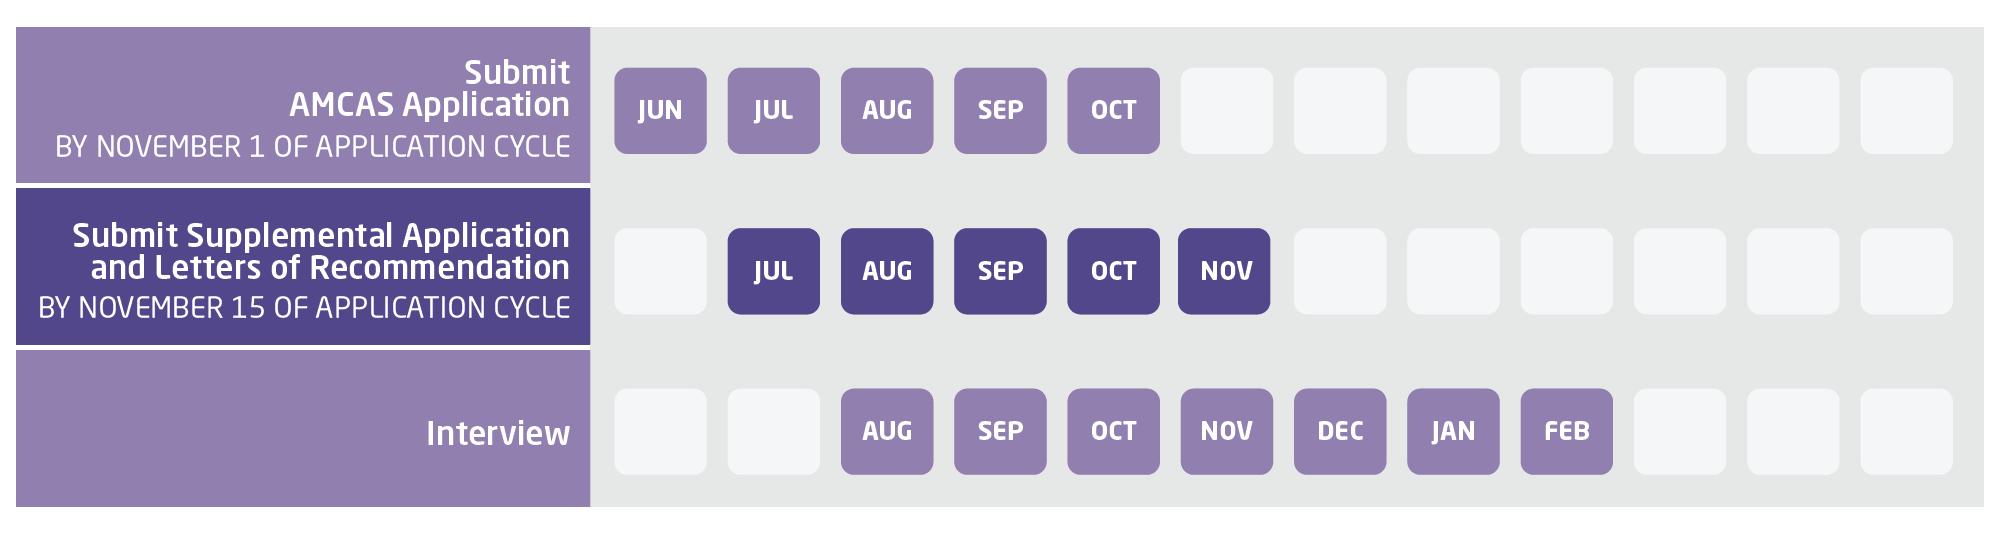 Northwestern Academic Calendar 2022.Northwestern Academic Calendar 2021 22 2022 Calendar